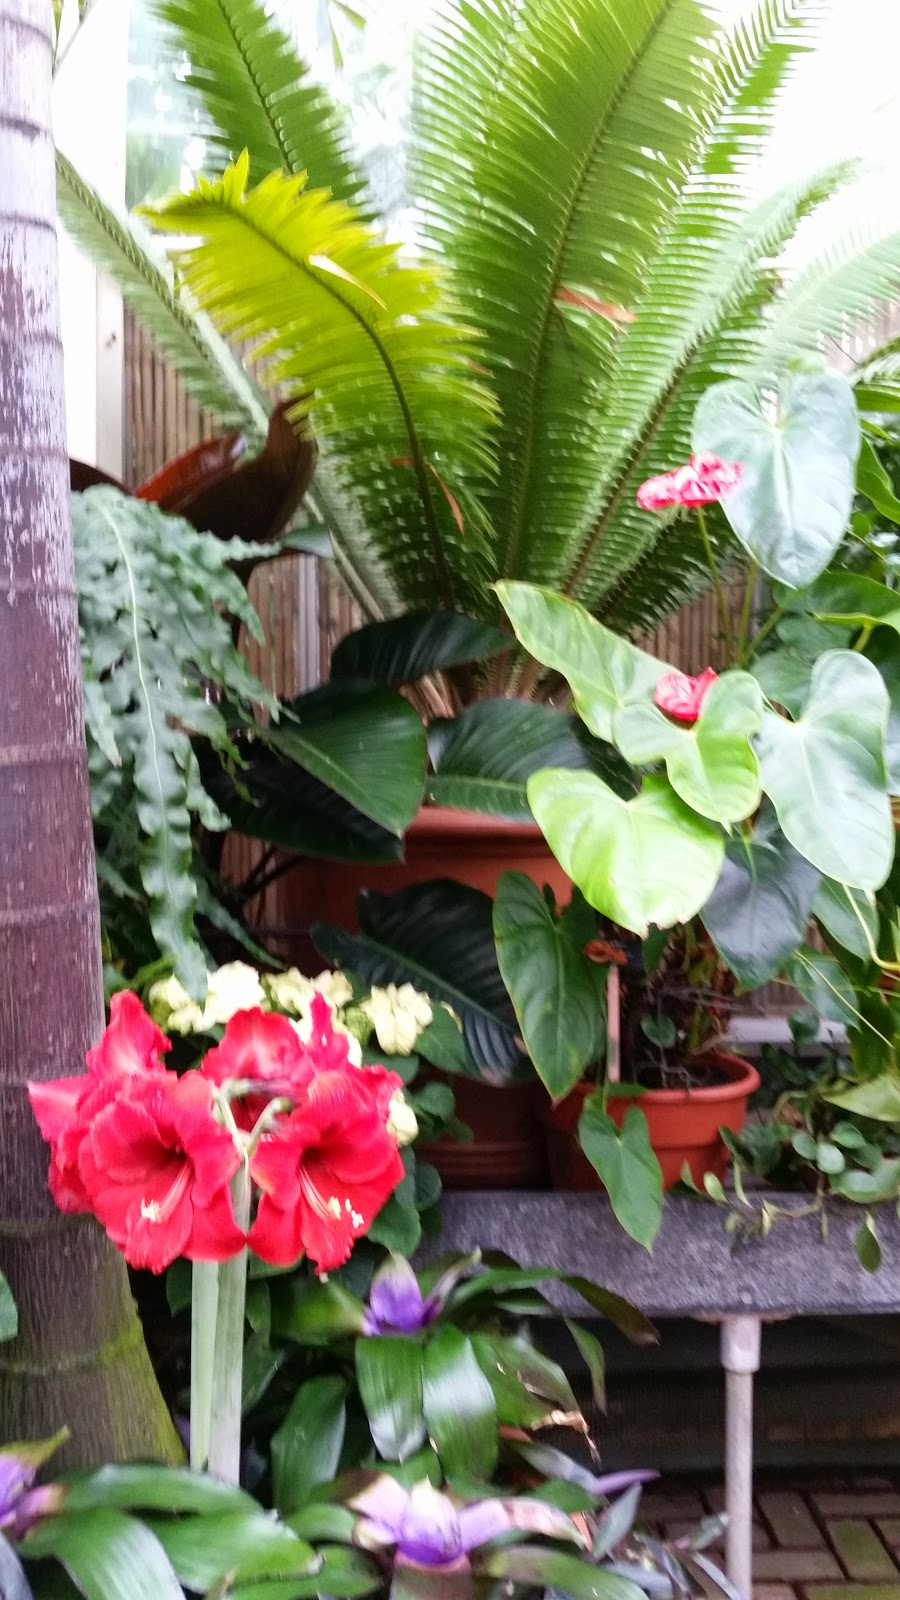 Tropical Plants 4.jpg